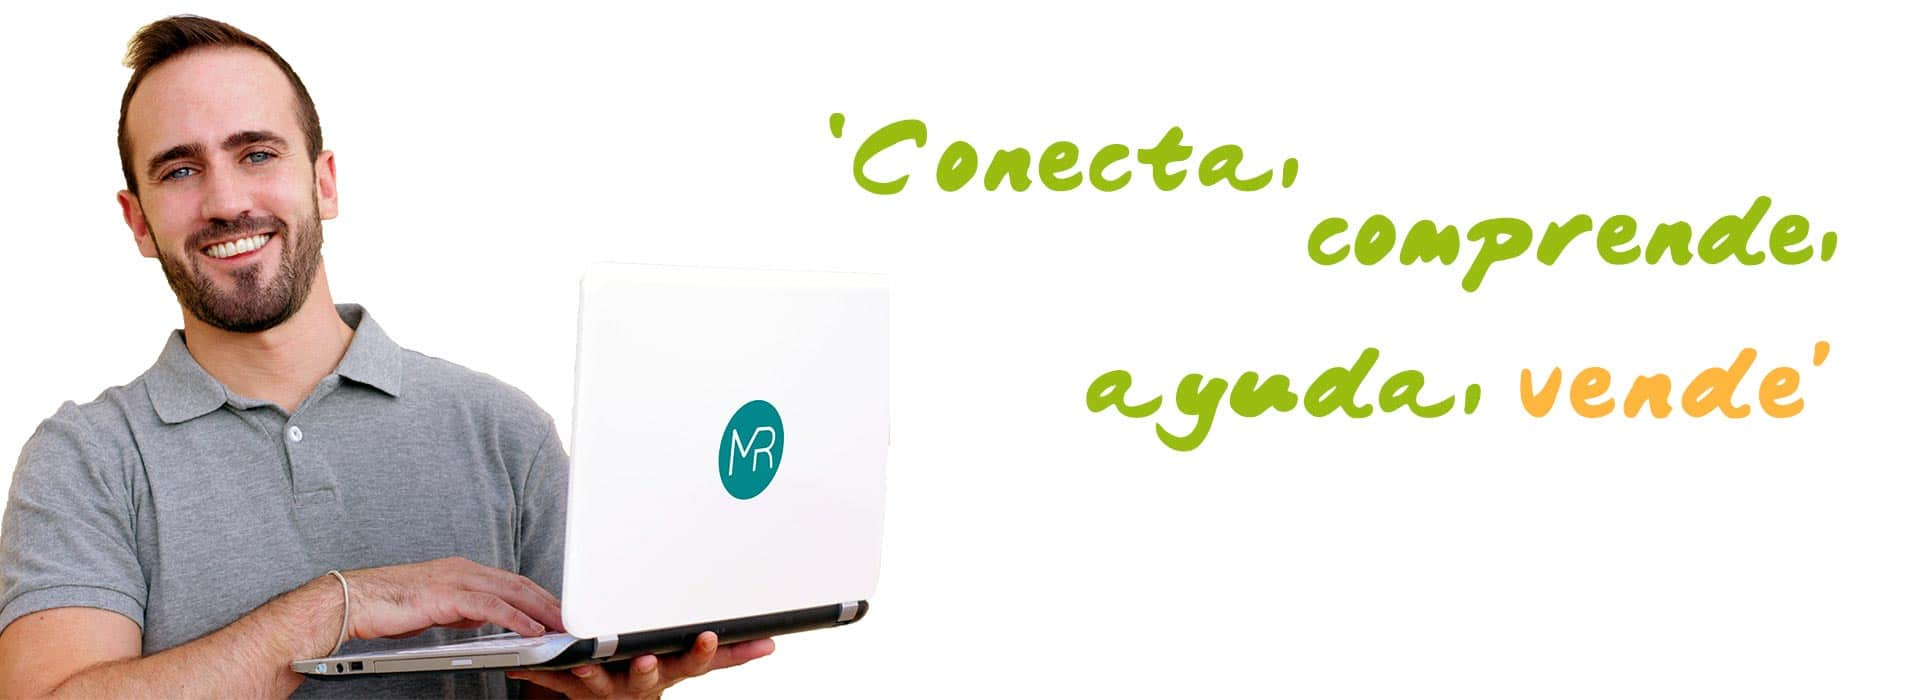 Miguel Revelles - Blog de Marketing Digital y Social Media